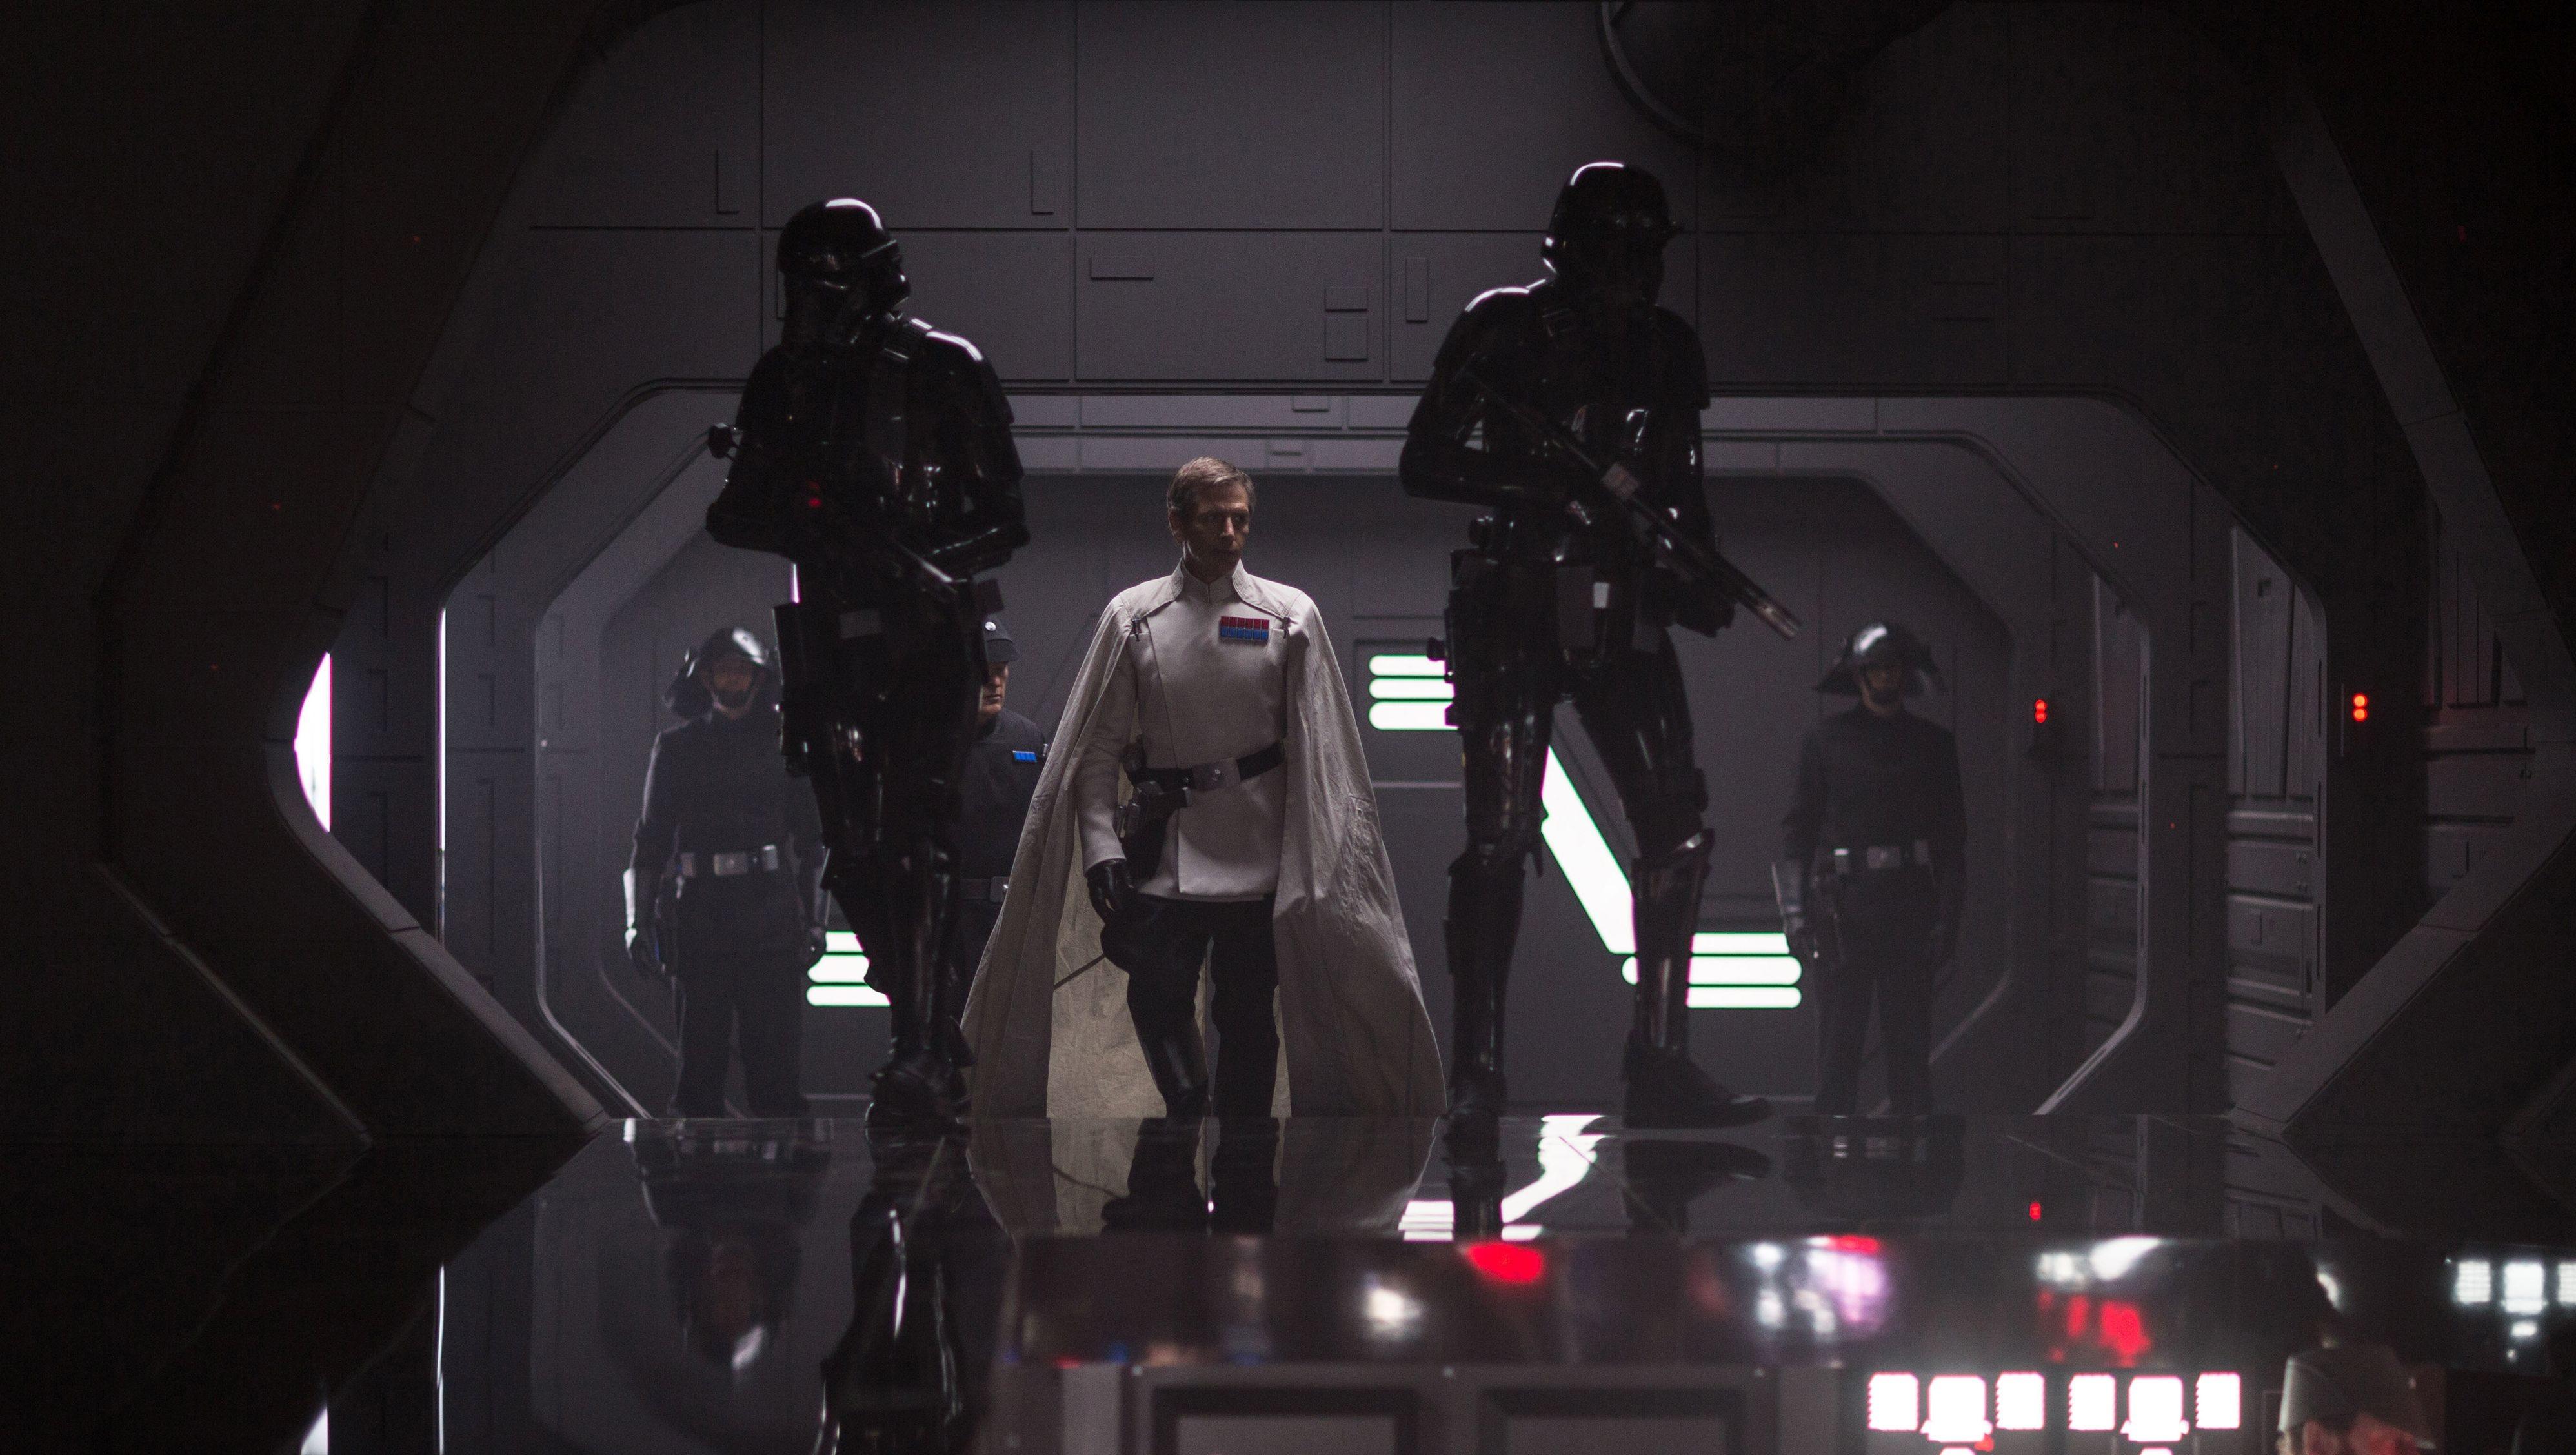 KrennicAndDeathTroopers-RogueOne.jpg